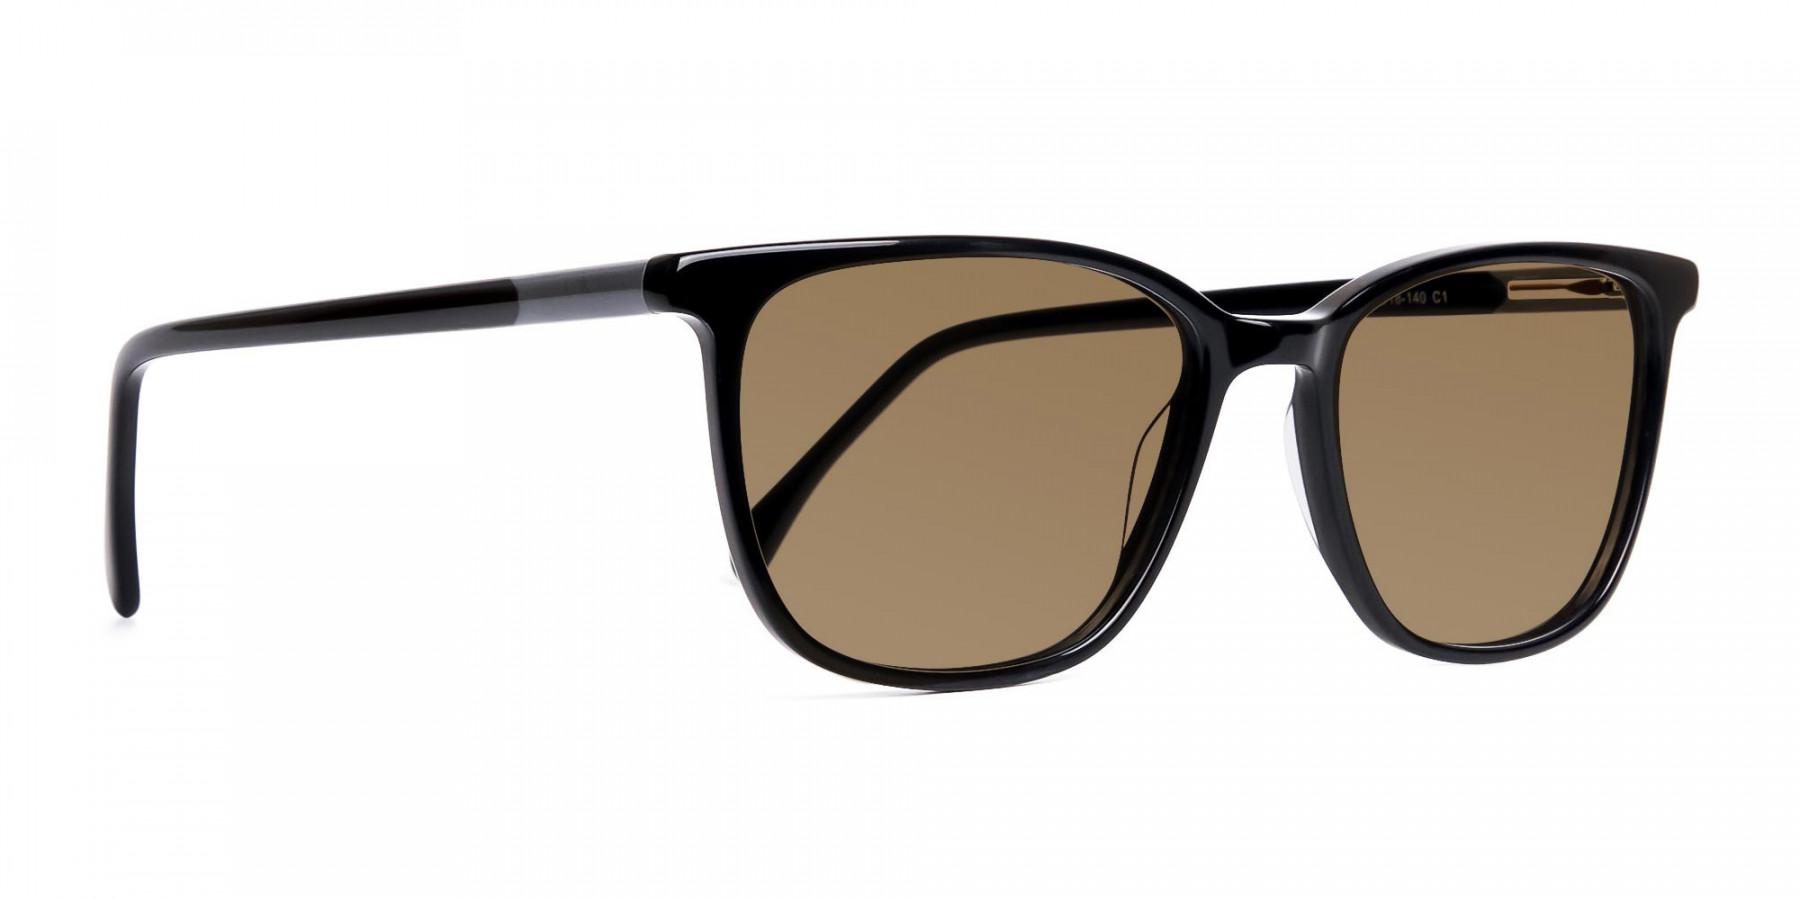 black-wayfarer-rectangular-dark-brown-tinted-sunglasses-frames-3